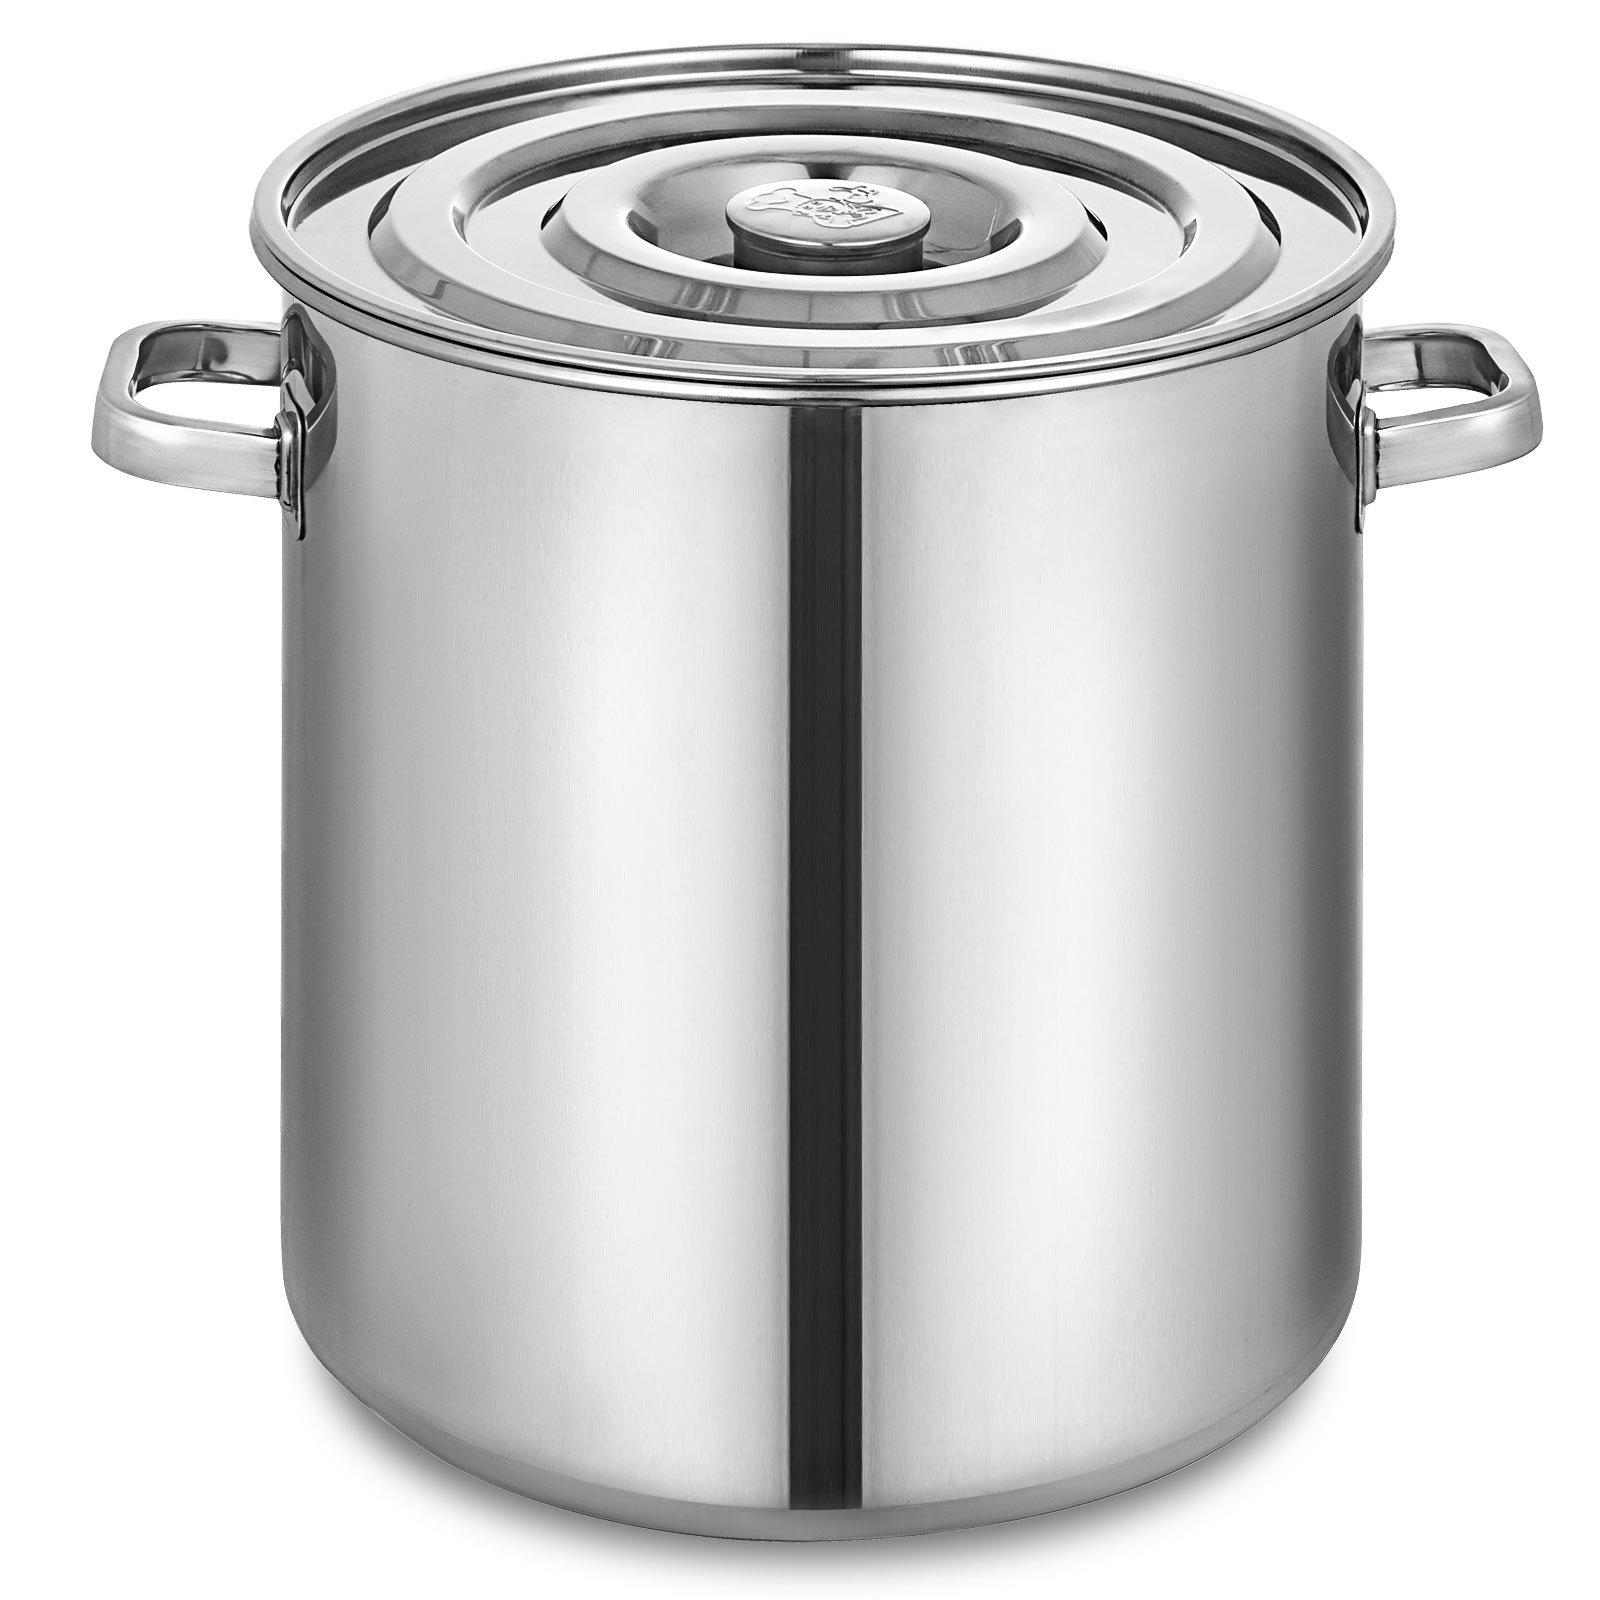 Mophorn Lid 18.5Gal Home Brew and Stock Pot Cookware, 74 Quart